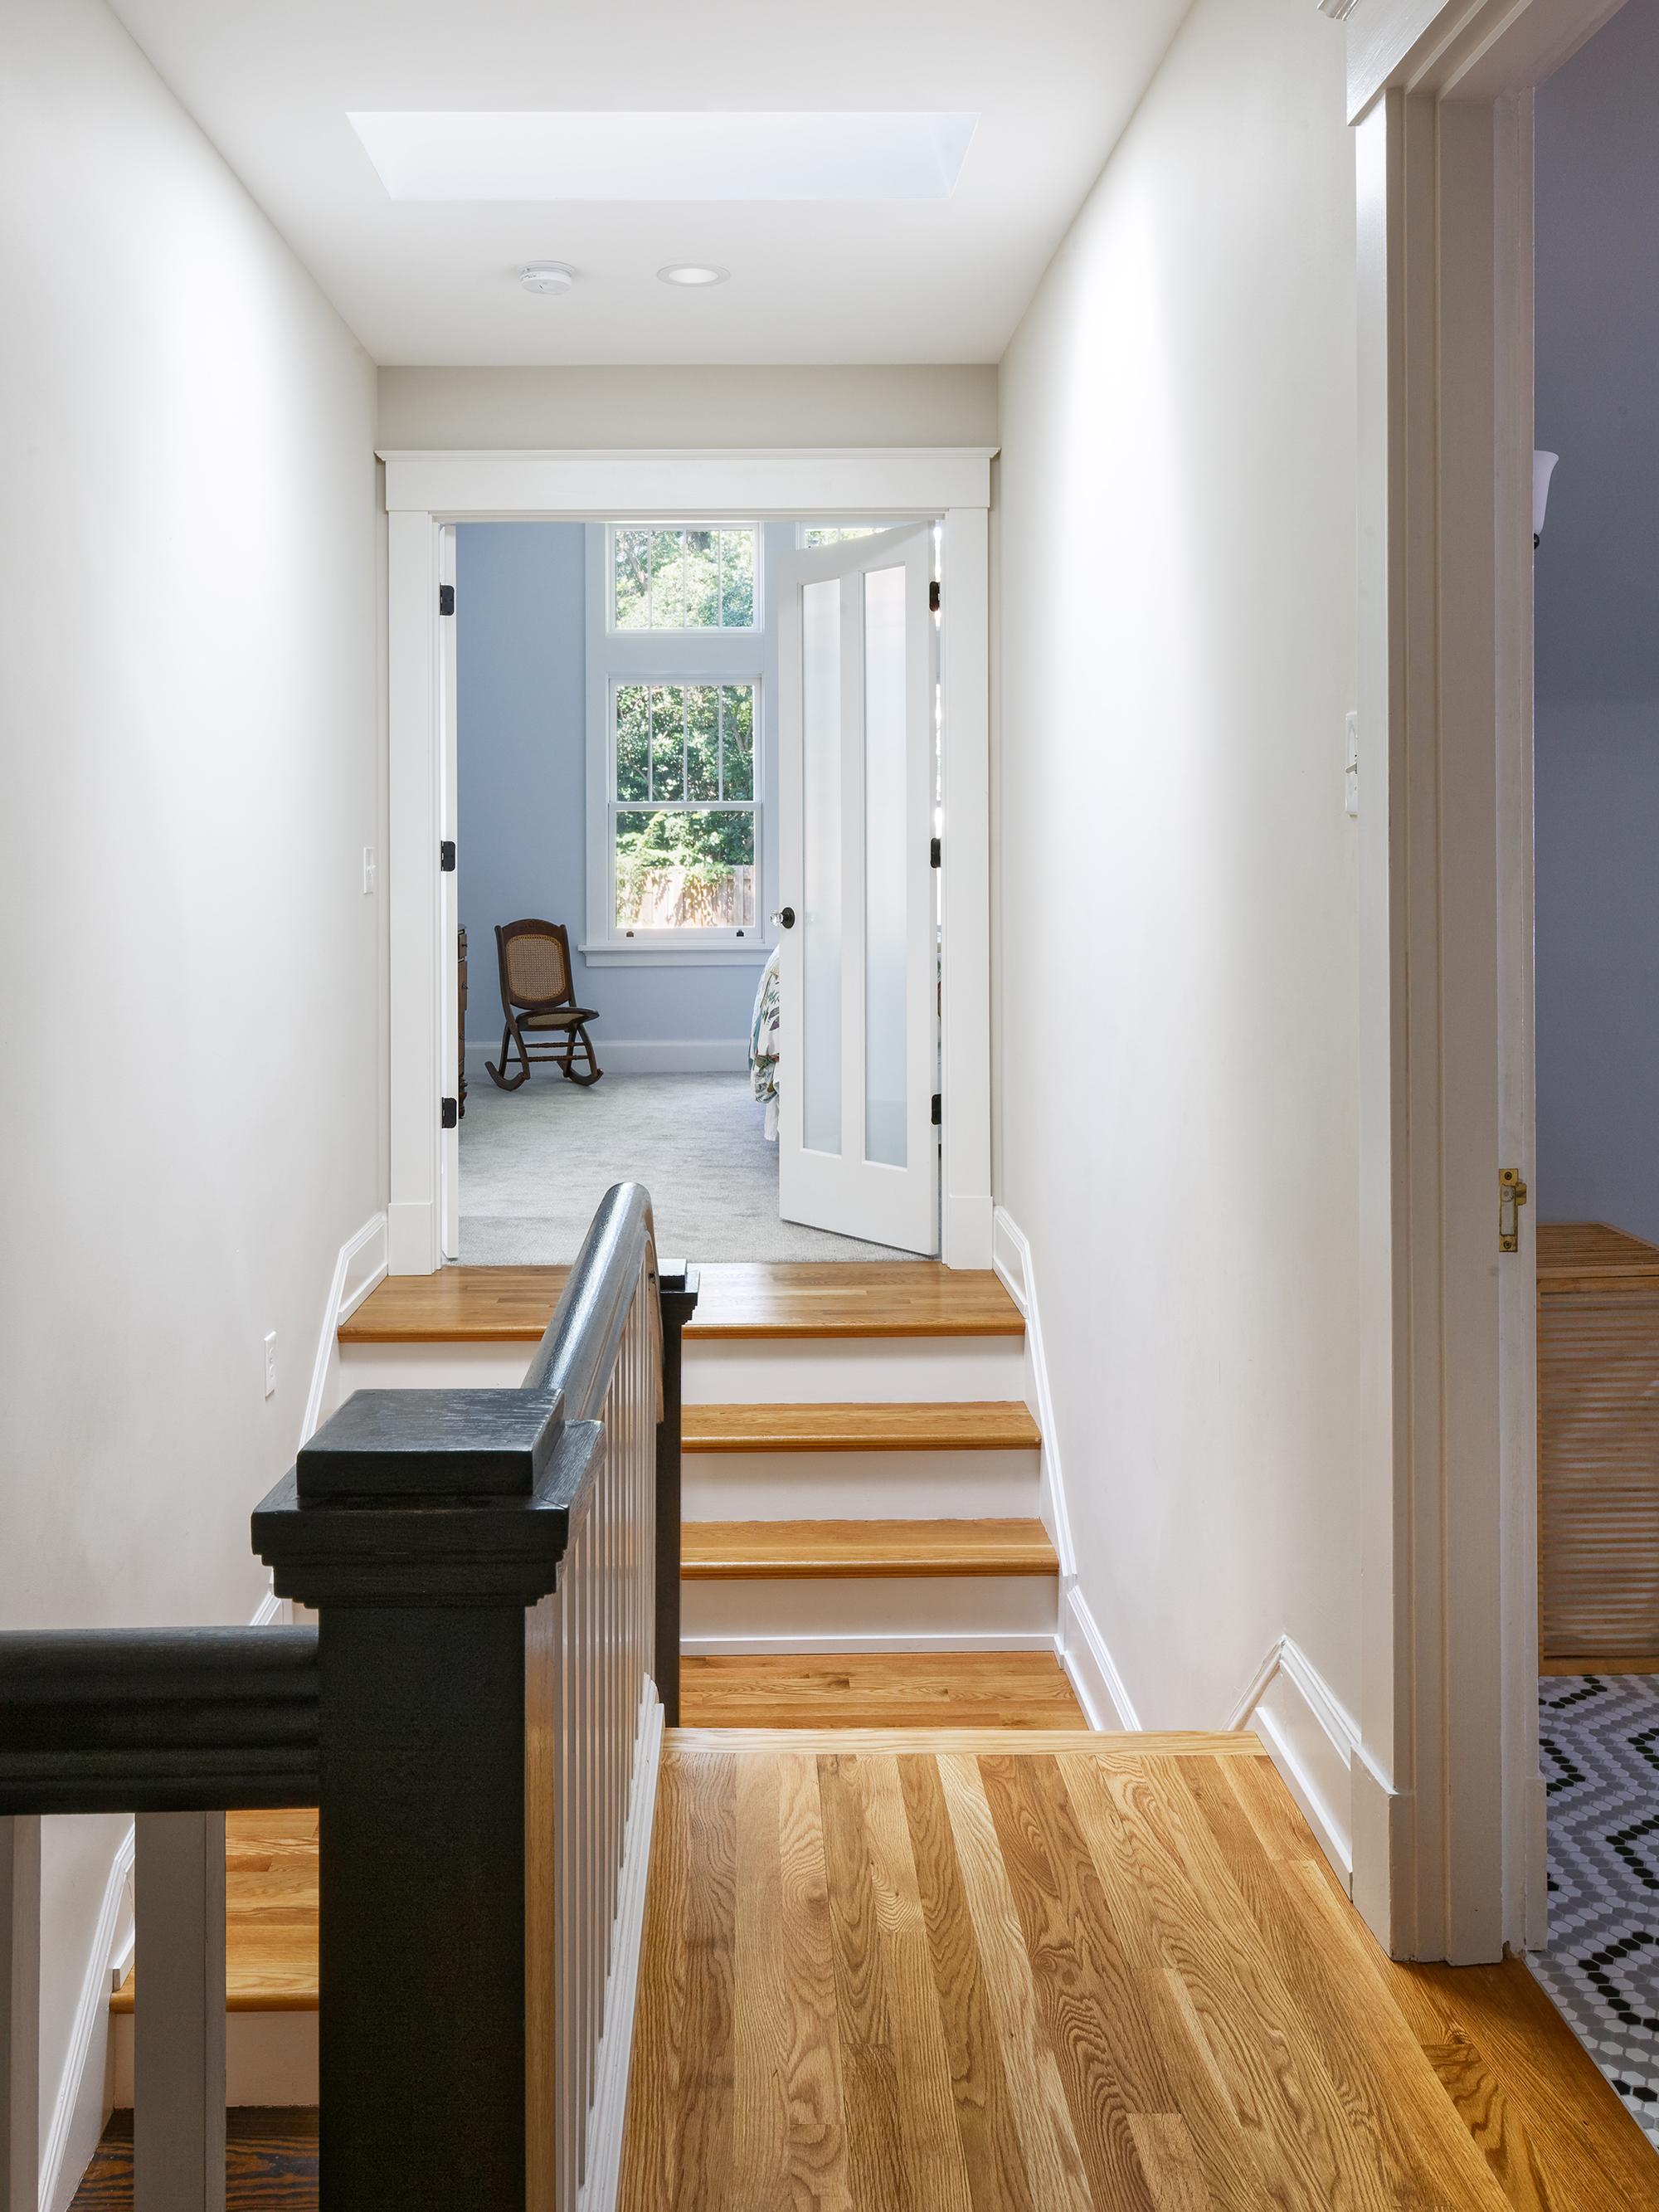 New master suite addition Wilcox Architecture